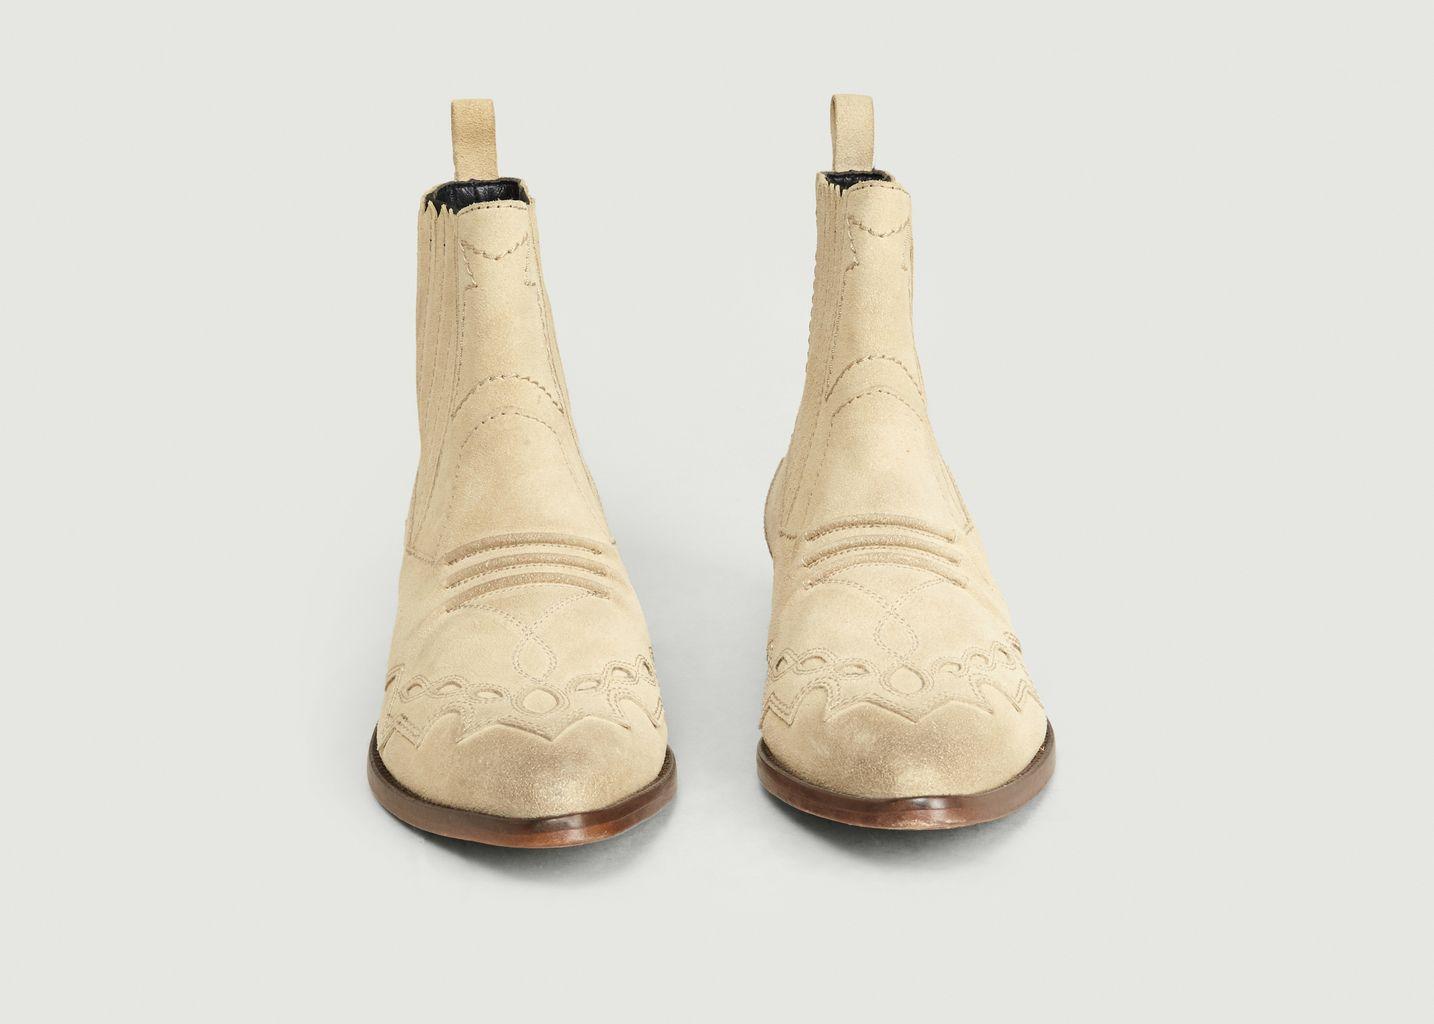 Boots Tucson Inspiration Santiags Ciment - Roseanna